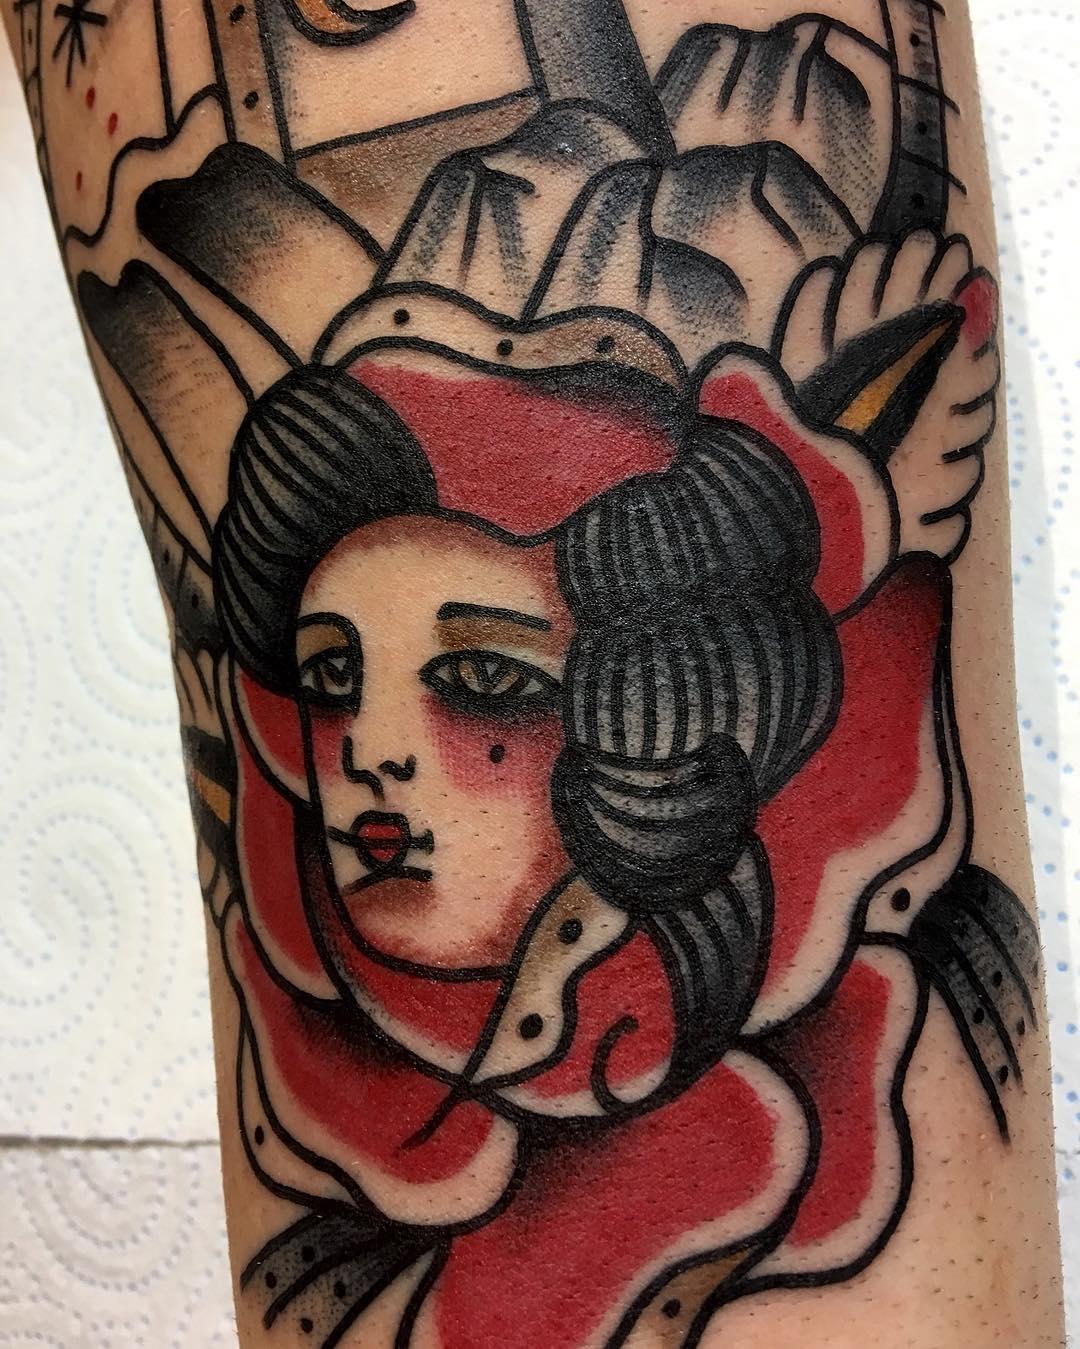 tattooart,art,artistic,old,oldschollshit,custommade,owl,tabasco,berlintattoo,barcelonatattoo,ibizatattoo,tabascotattooer,bestattooers,tradicionaltattooers,bestisbest,tatuajes,berlintattooers,ontheroad,classictattoo,oldlines,ciudadreal,malagatattooconvention,tradworkers,tradtattoo,follow4follow,followme,ciudadreal,castillalamancha,puertollano,almagro